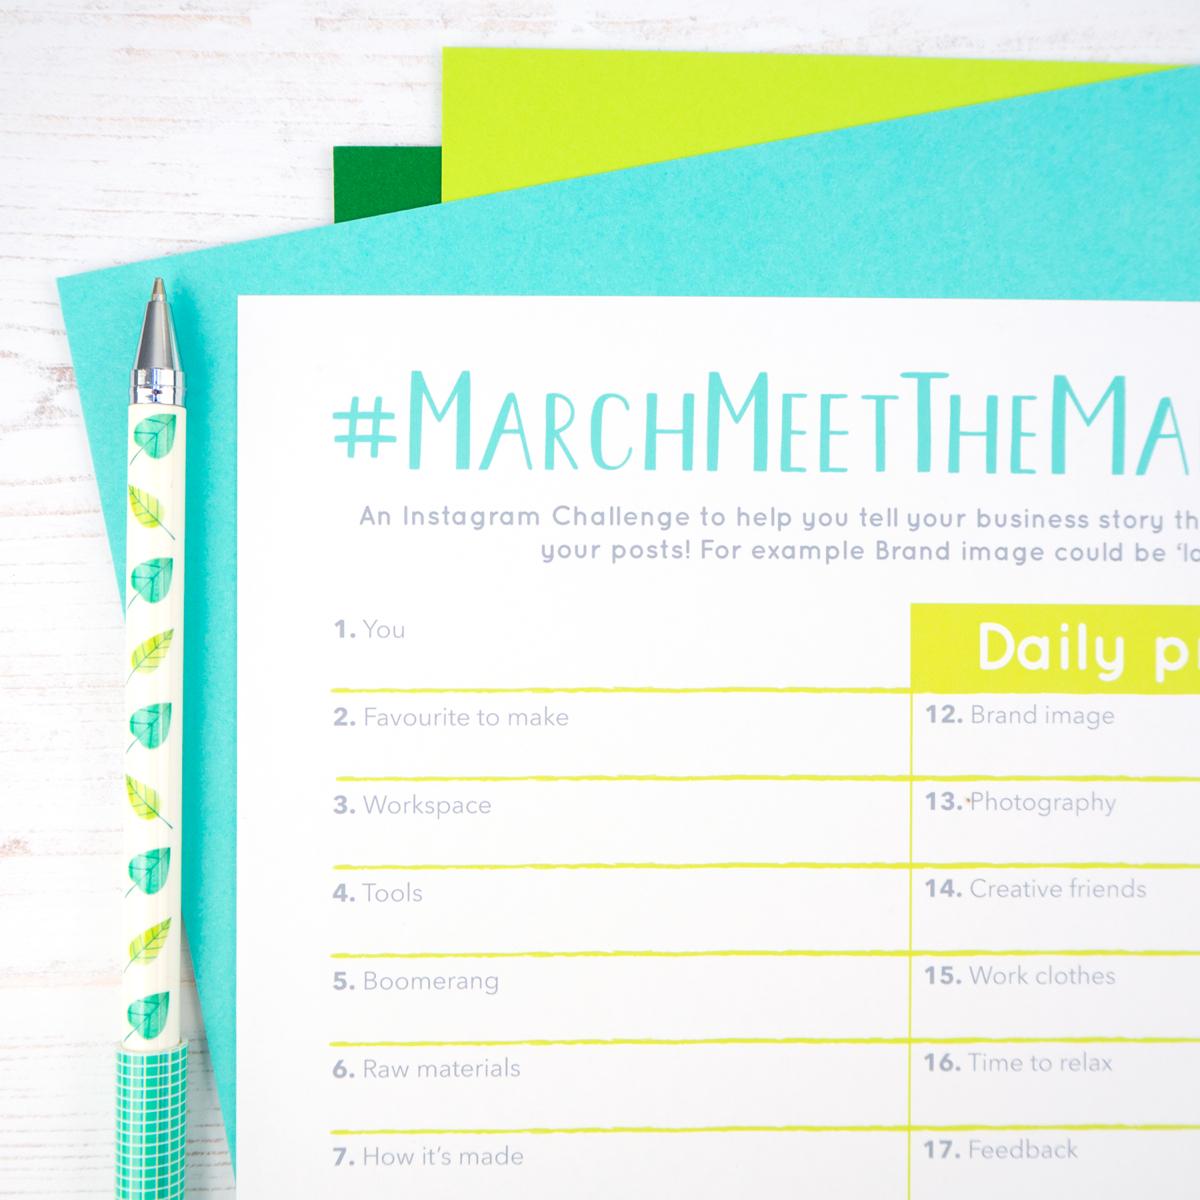 Marchmeethemaker, meethemaker tag, Instagram challenge, Joanne Hawker, interview